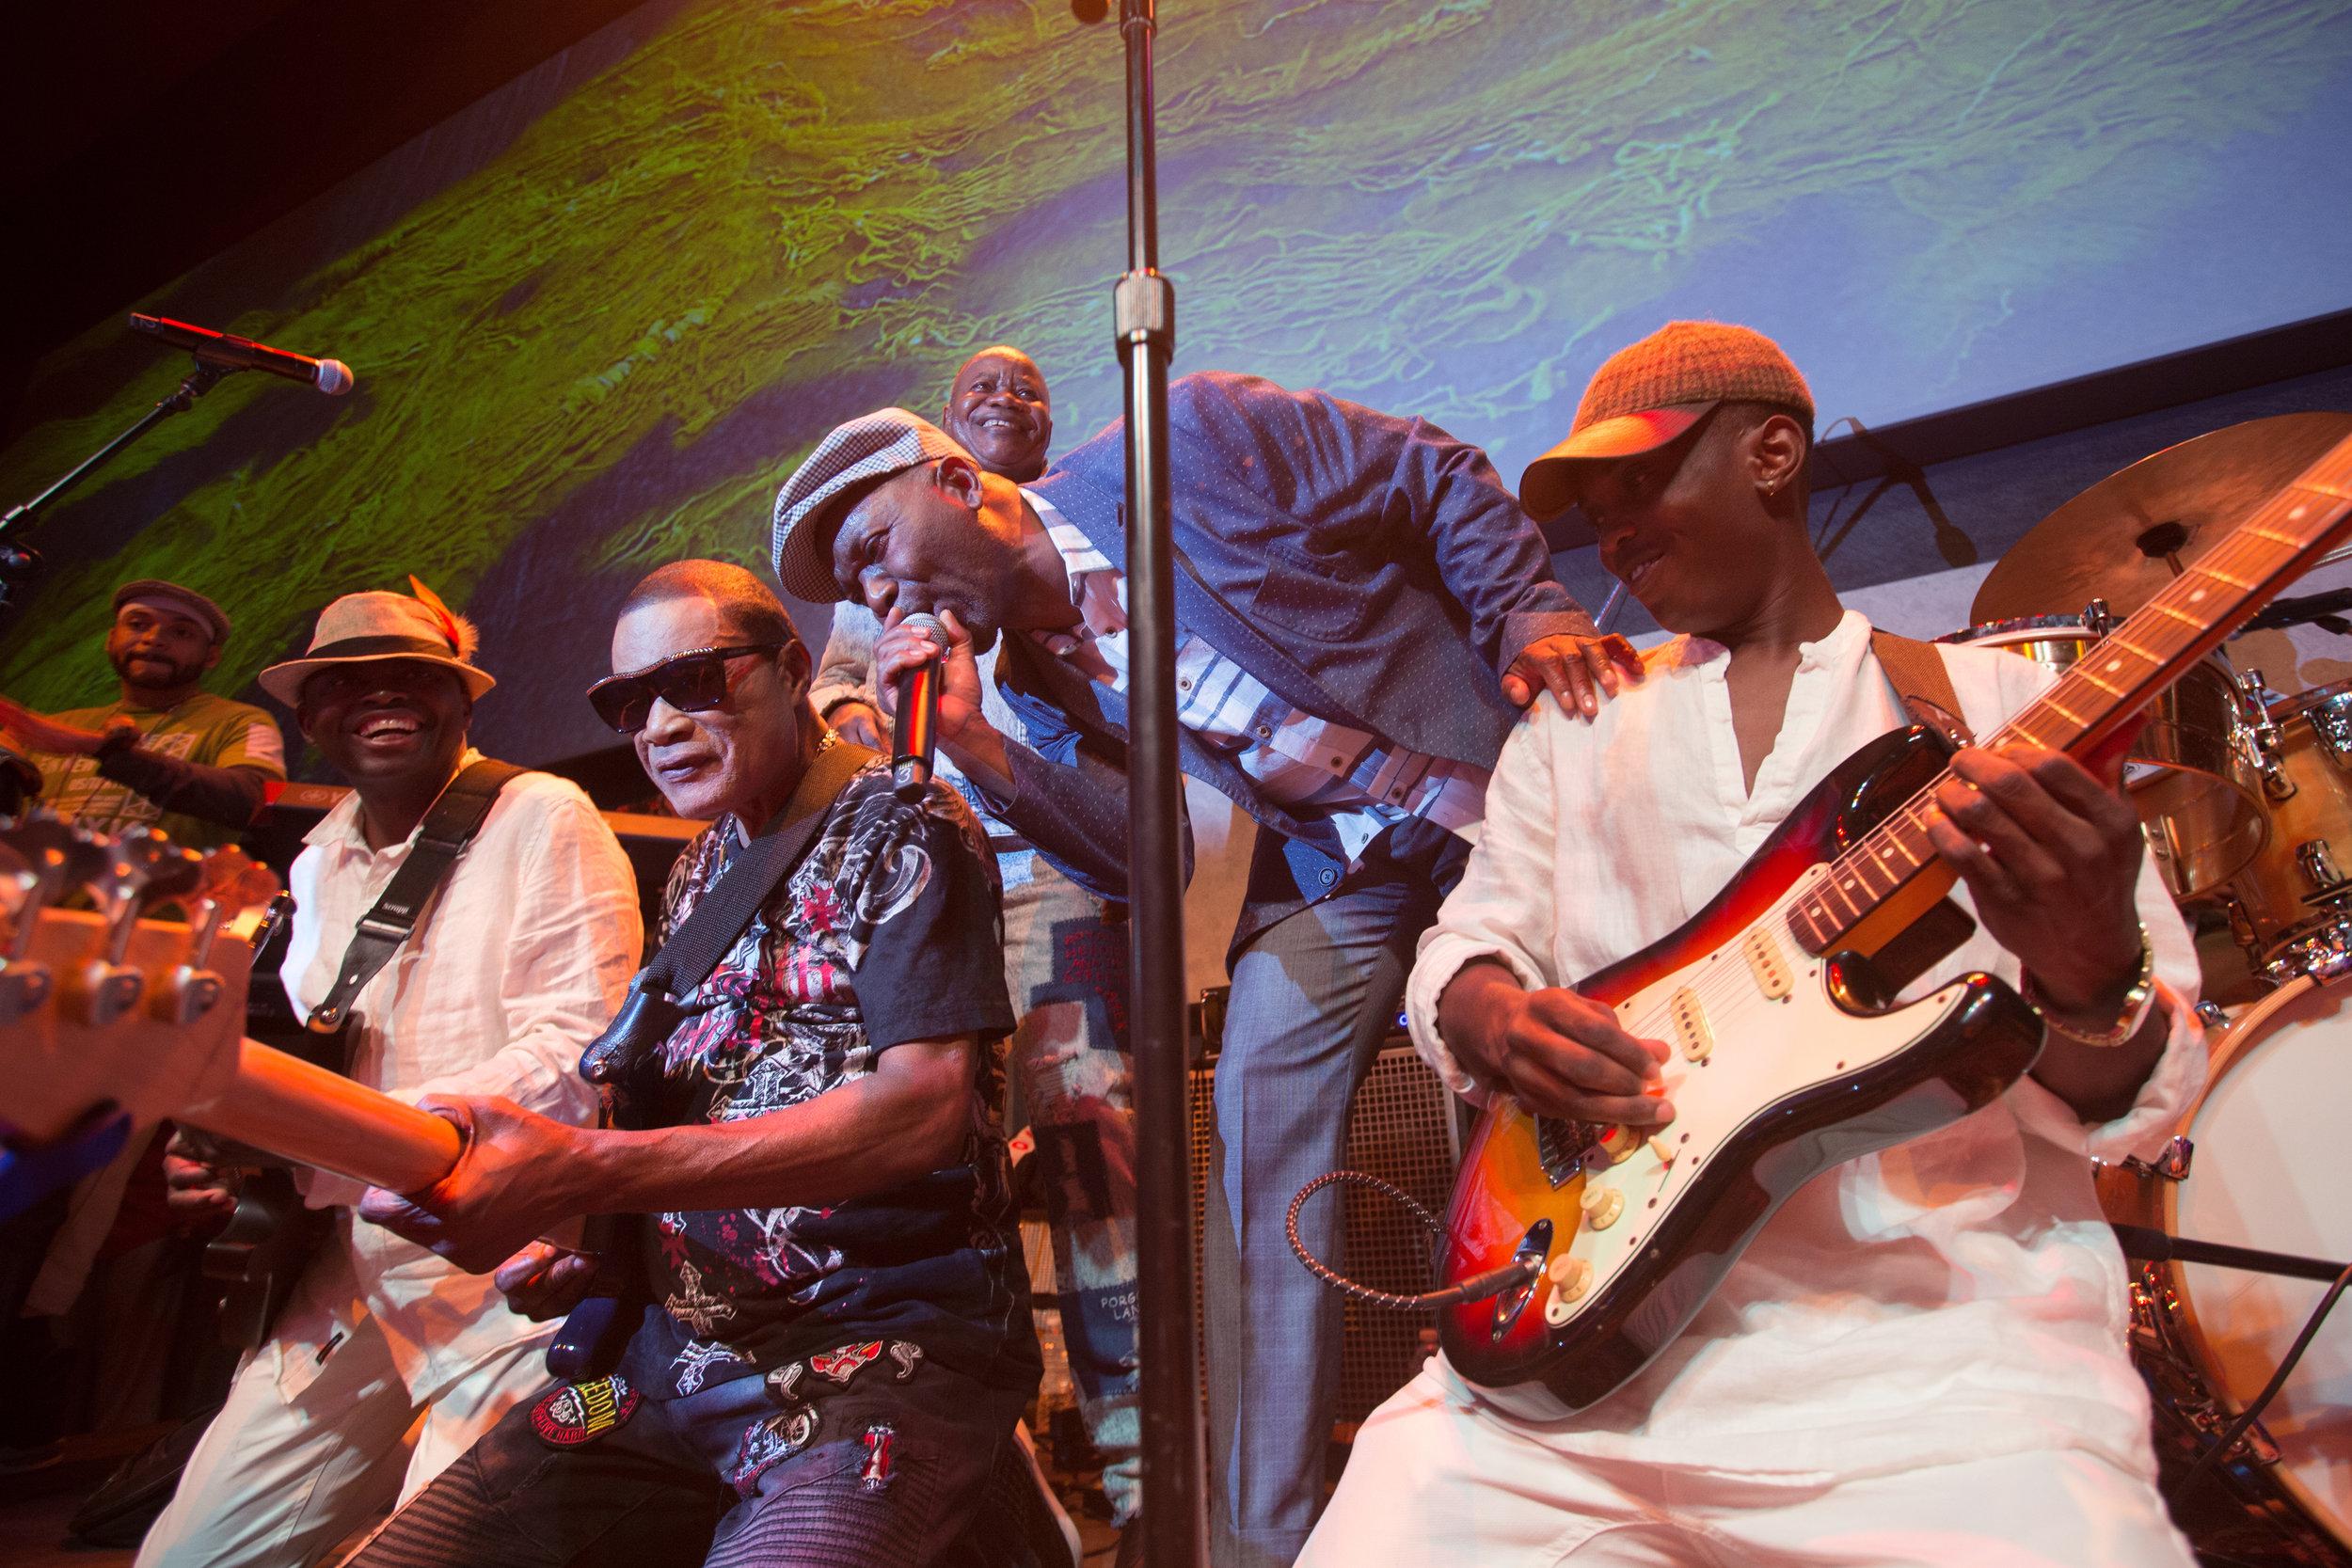 (L-R) Elie Kihonia, Ngouma Lokito, bass; Luciana Demingongo, vocals; Yonhi Sungu, guitar